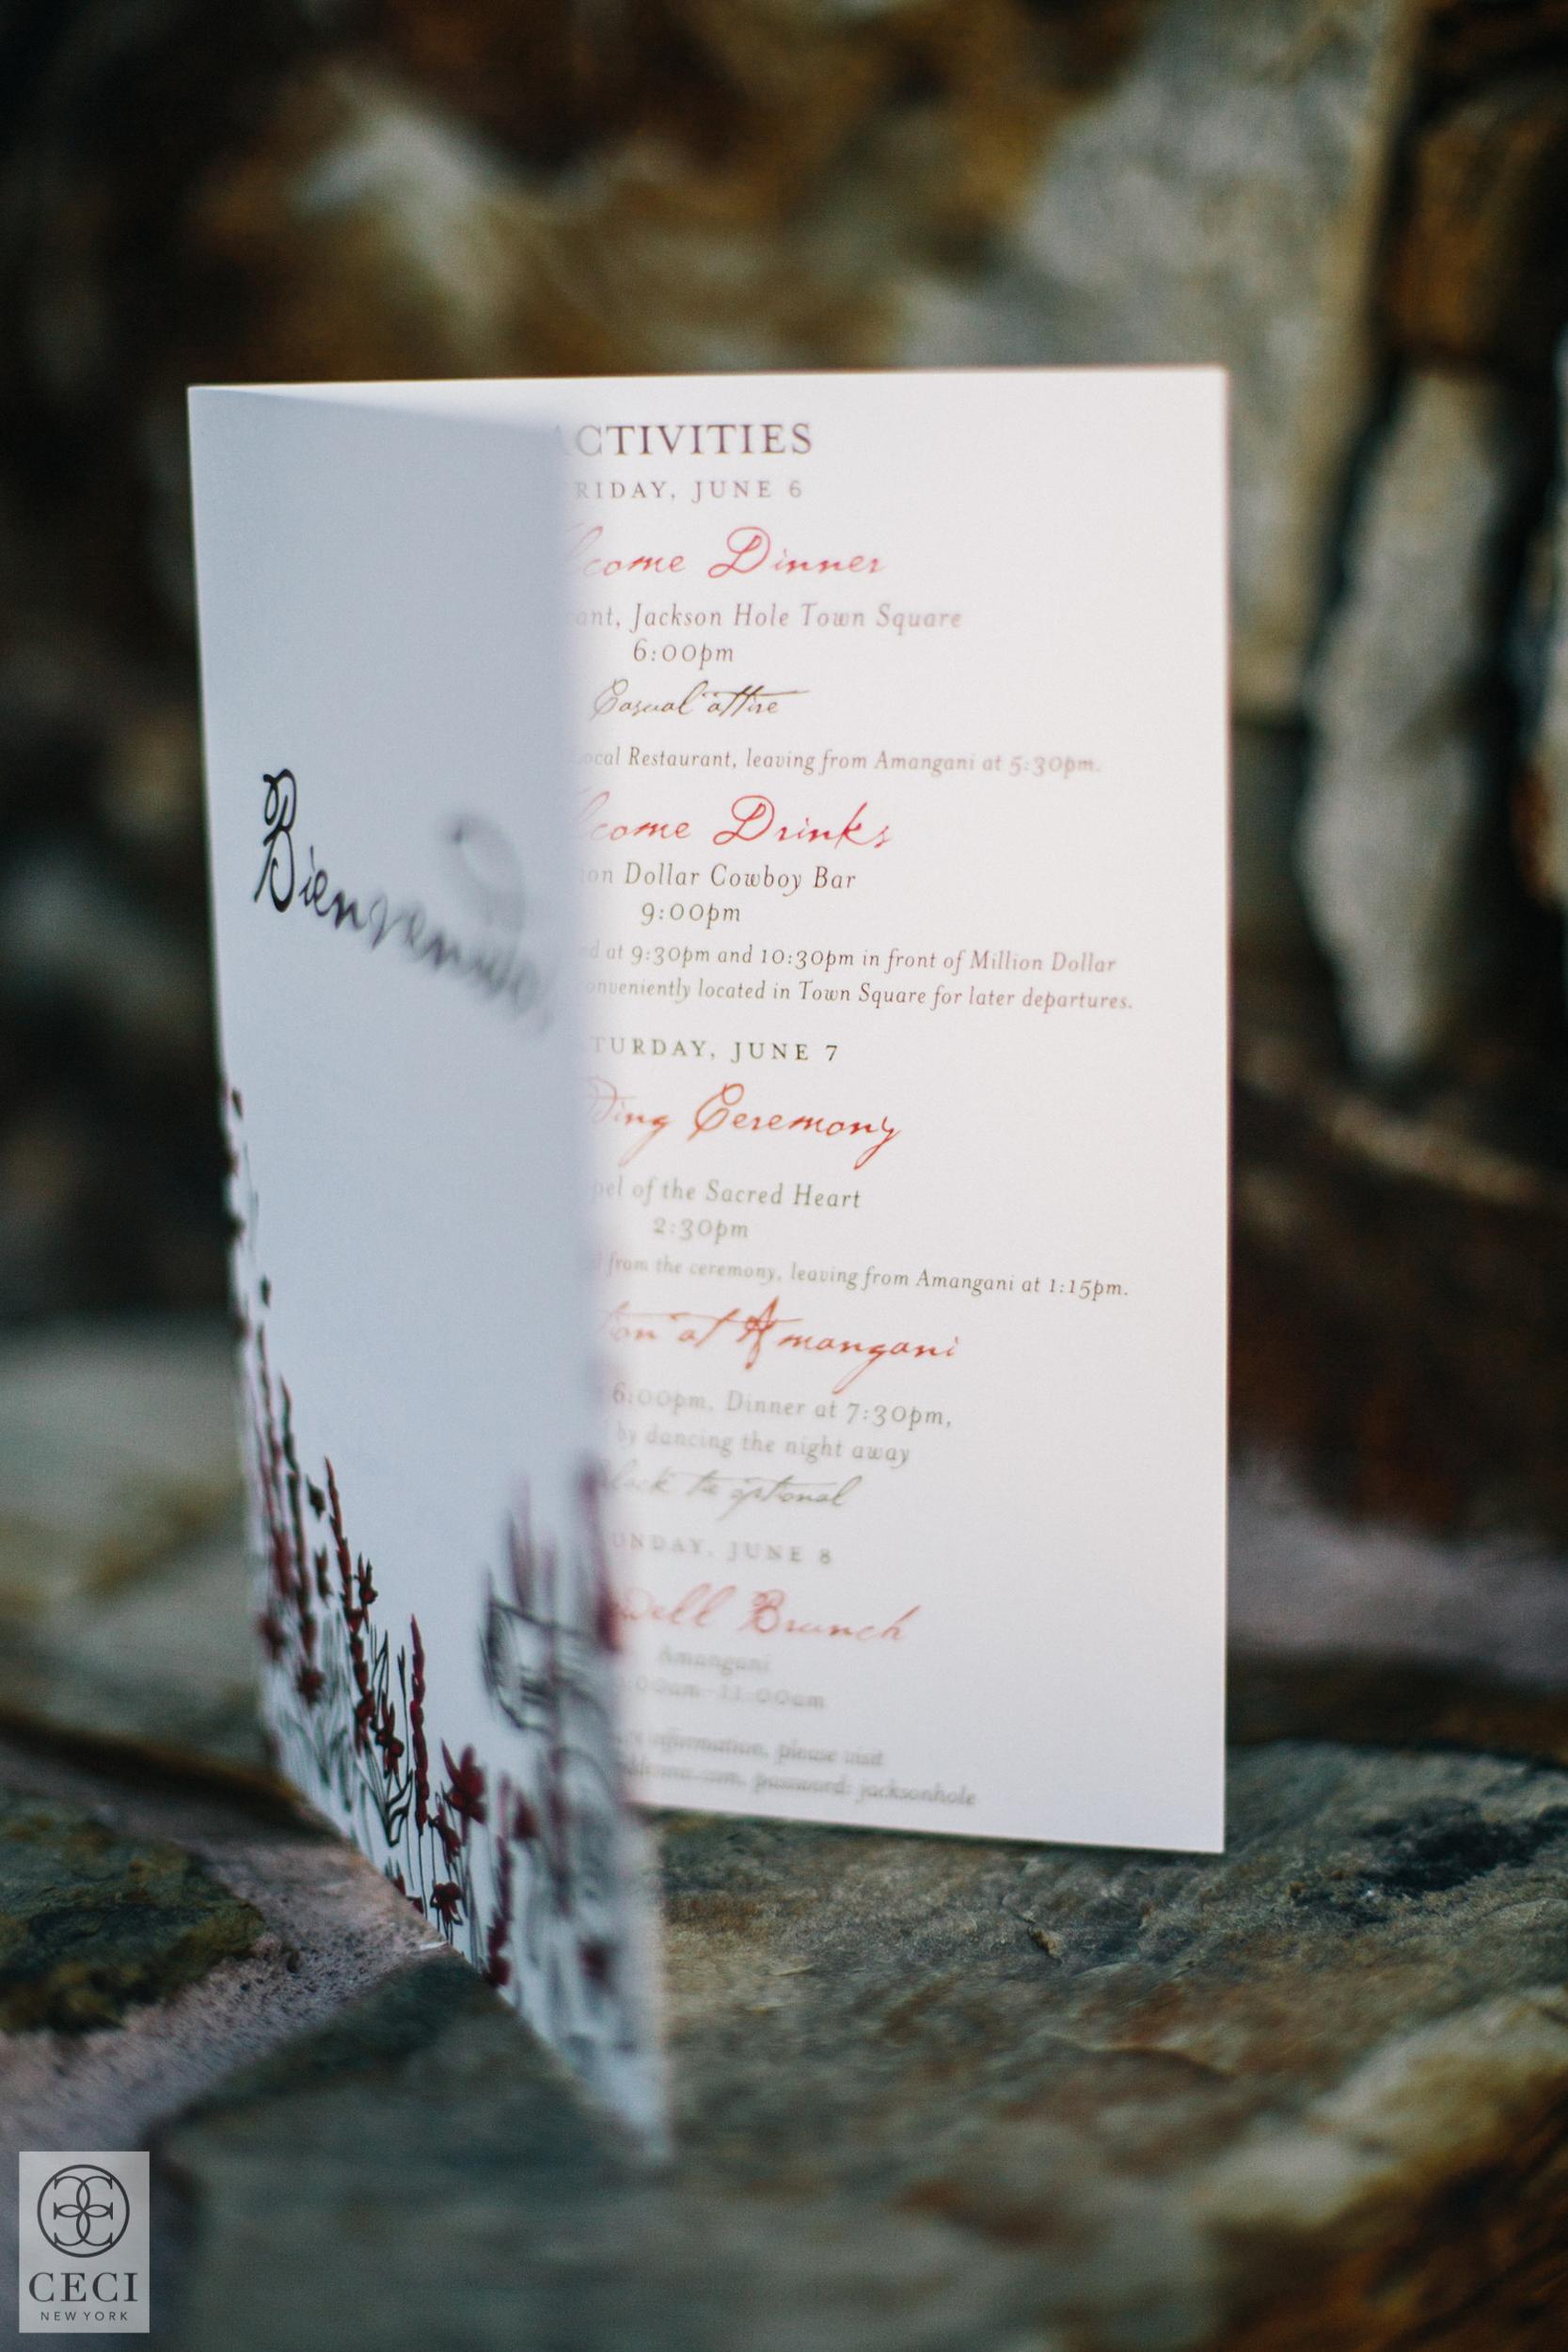 Ceci_New_York_Lyndsey_Hamilton_Events_Invitations_Wedding_Amangani_Elegance_Gold_Foil_Letterpress_Classic_Stamping_Custom_Couture_Personalized-5.jpg